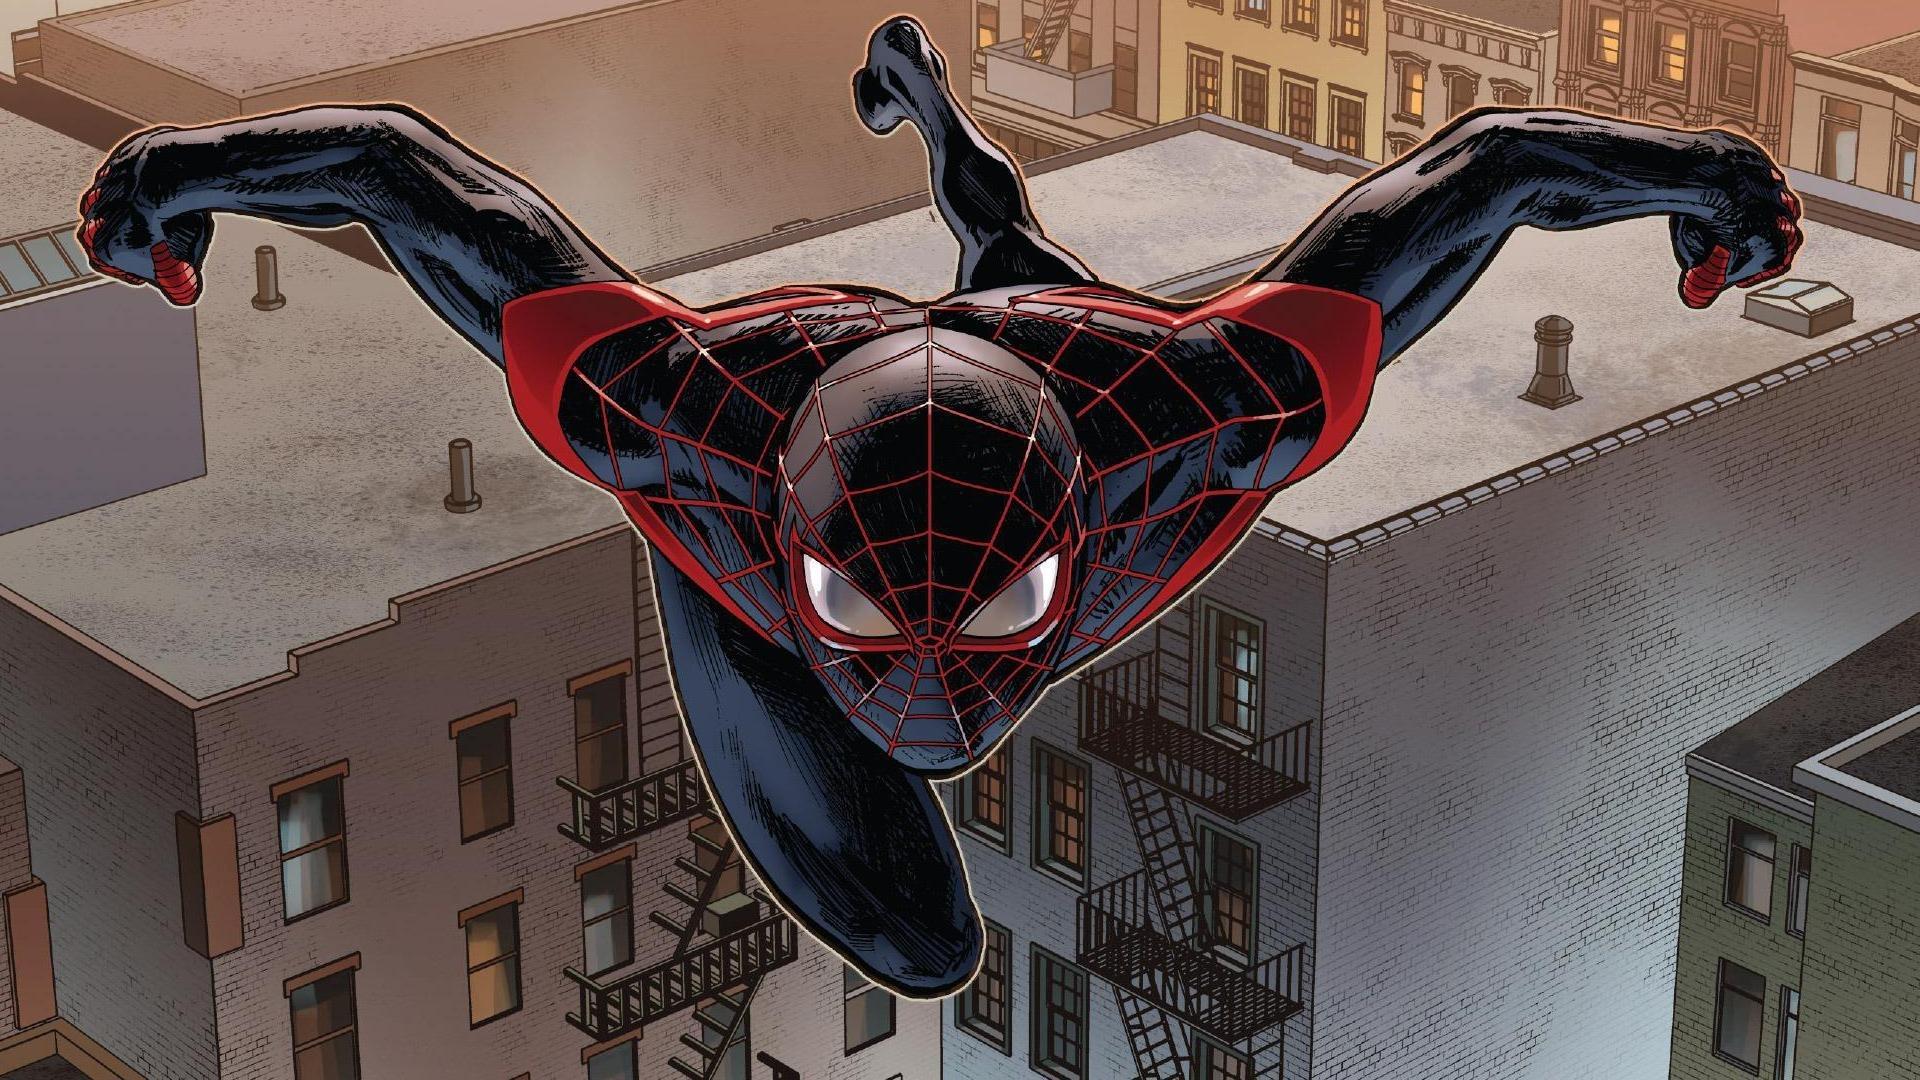 miles morales images miles morales: ultimate spider-man hd wallpaper